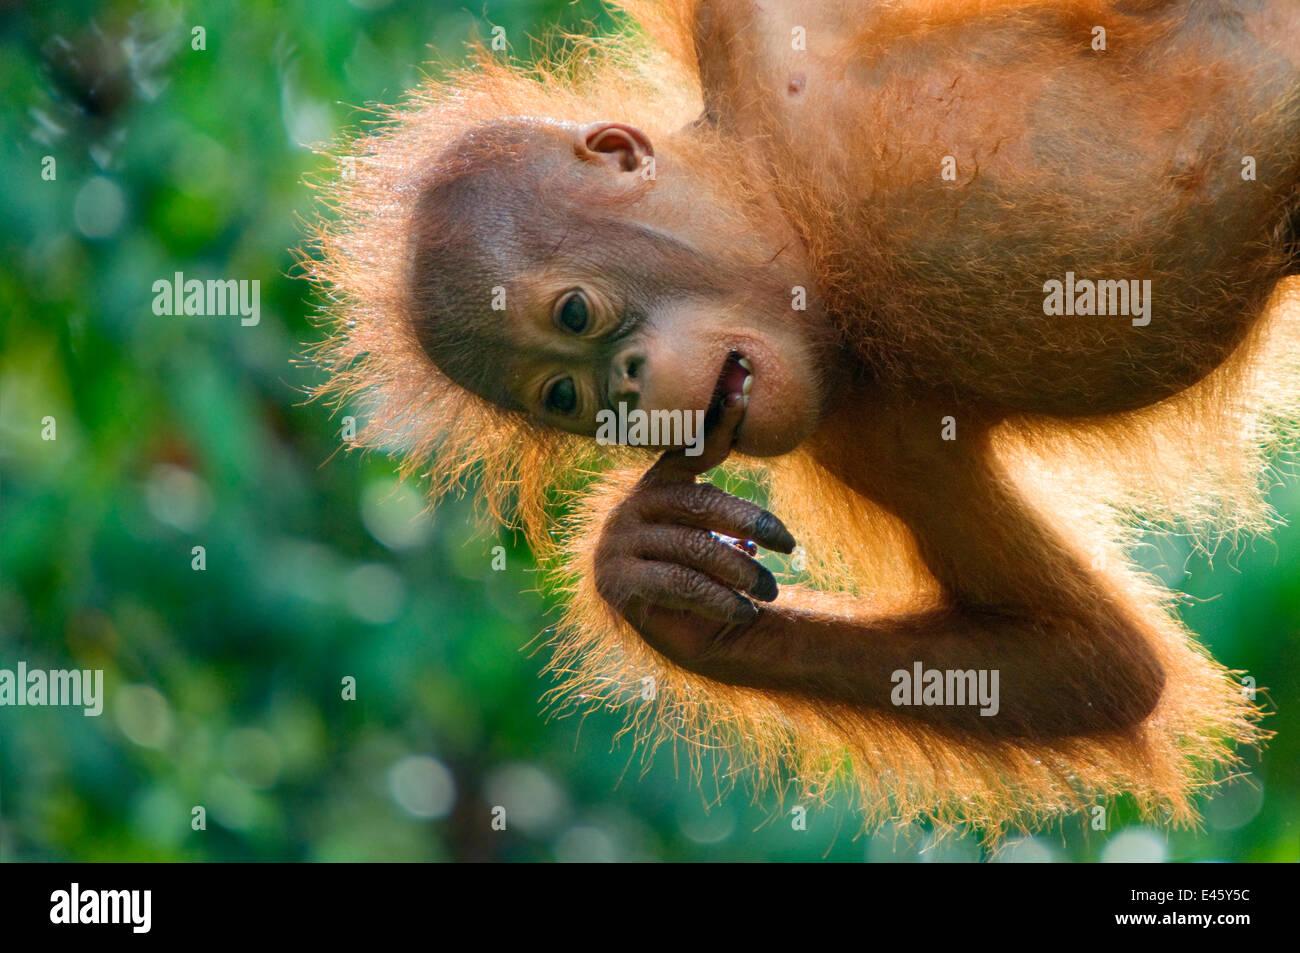 Orang utan (Pongo pygmaeus) baby hanging from trees, and chewing on fingers,  Semengoh Nature reserve, Sarawak, - Stock Image